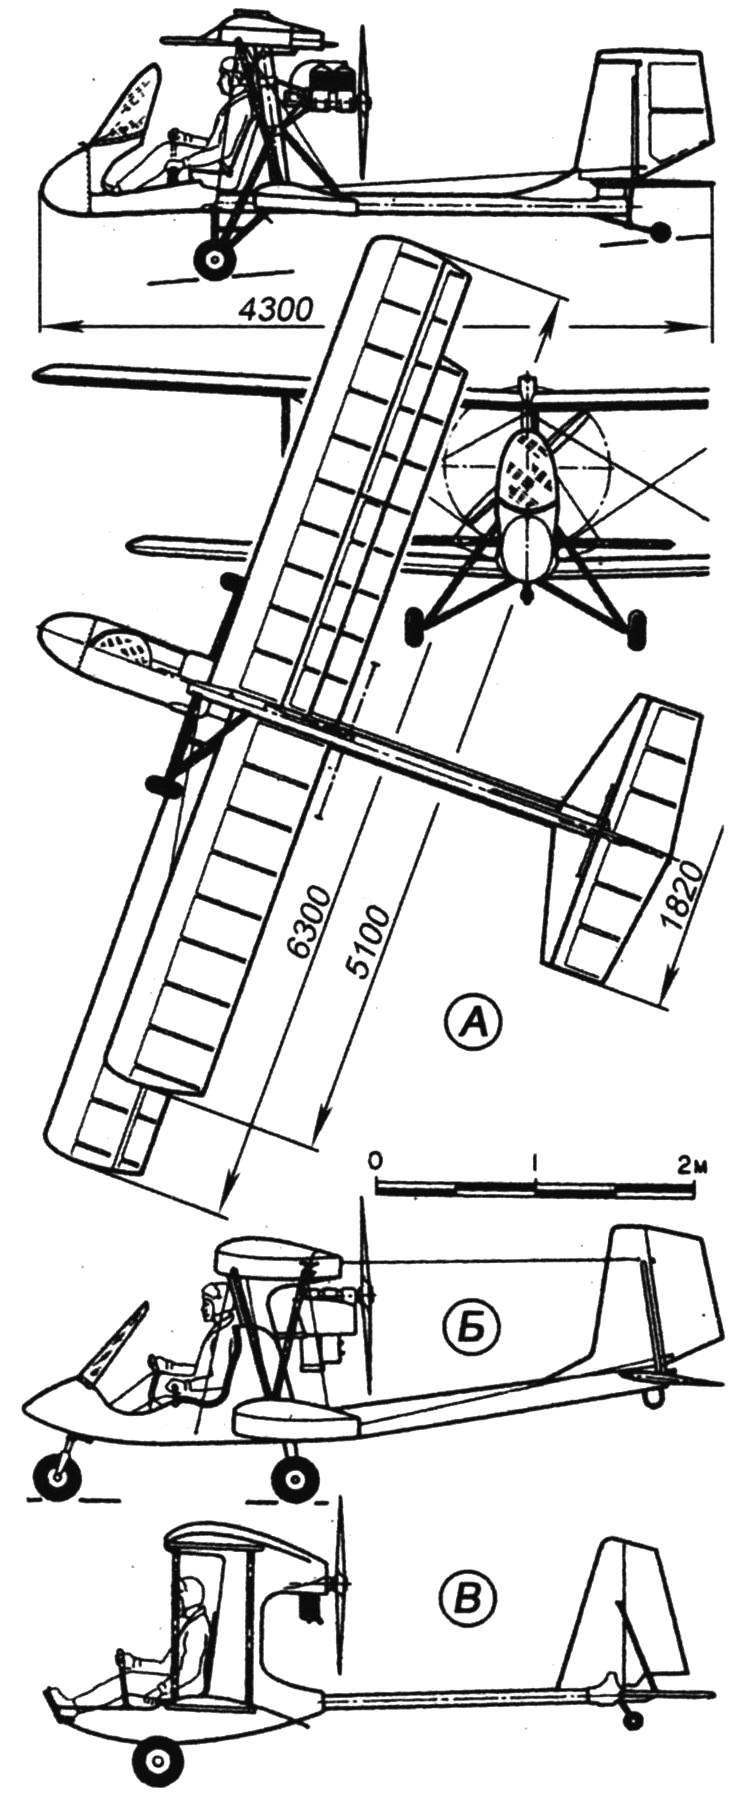 Одноместные самолёты-бипланы